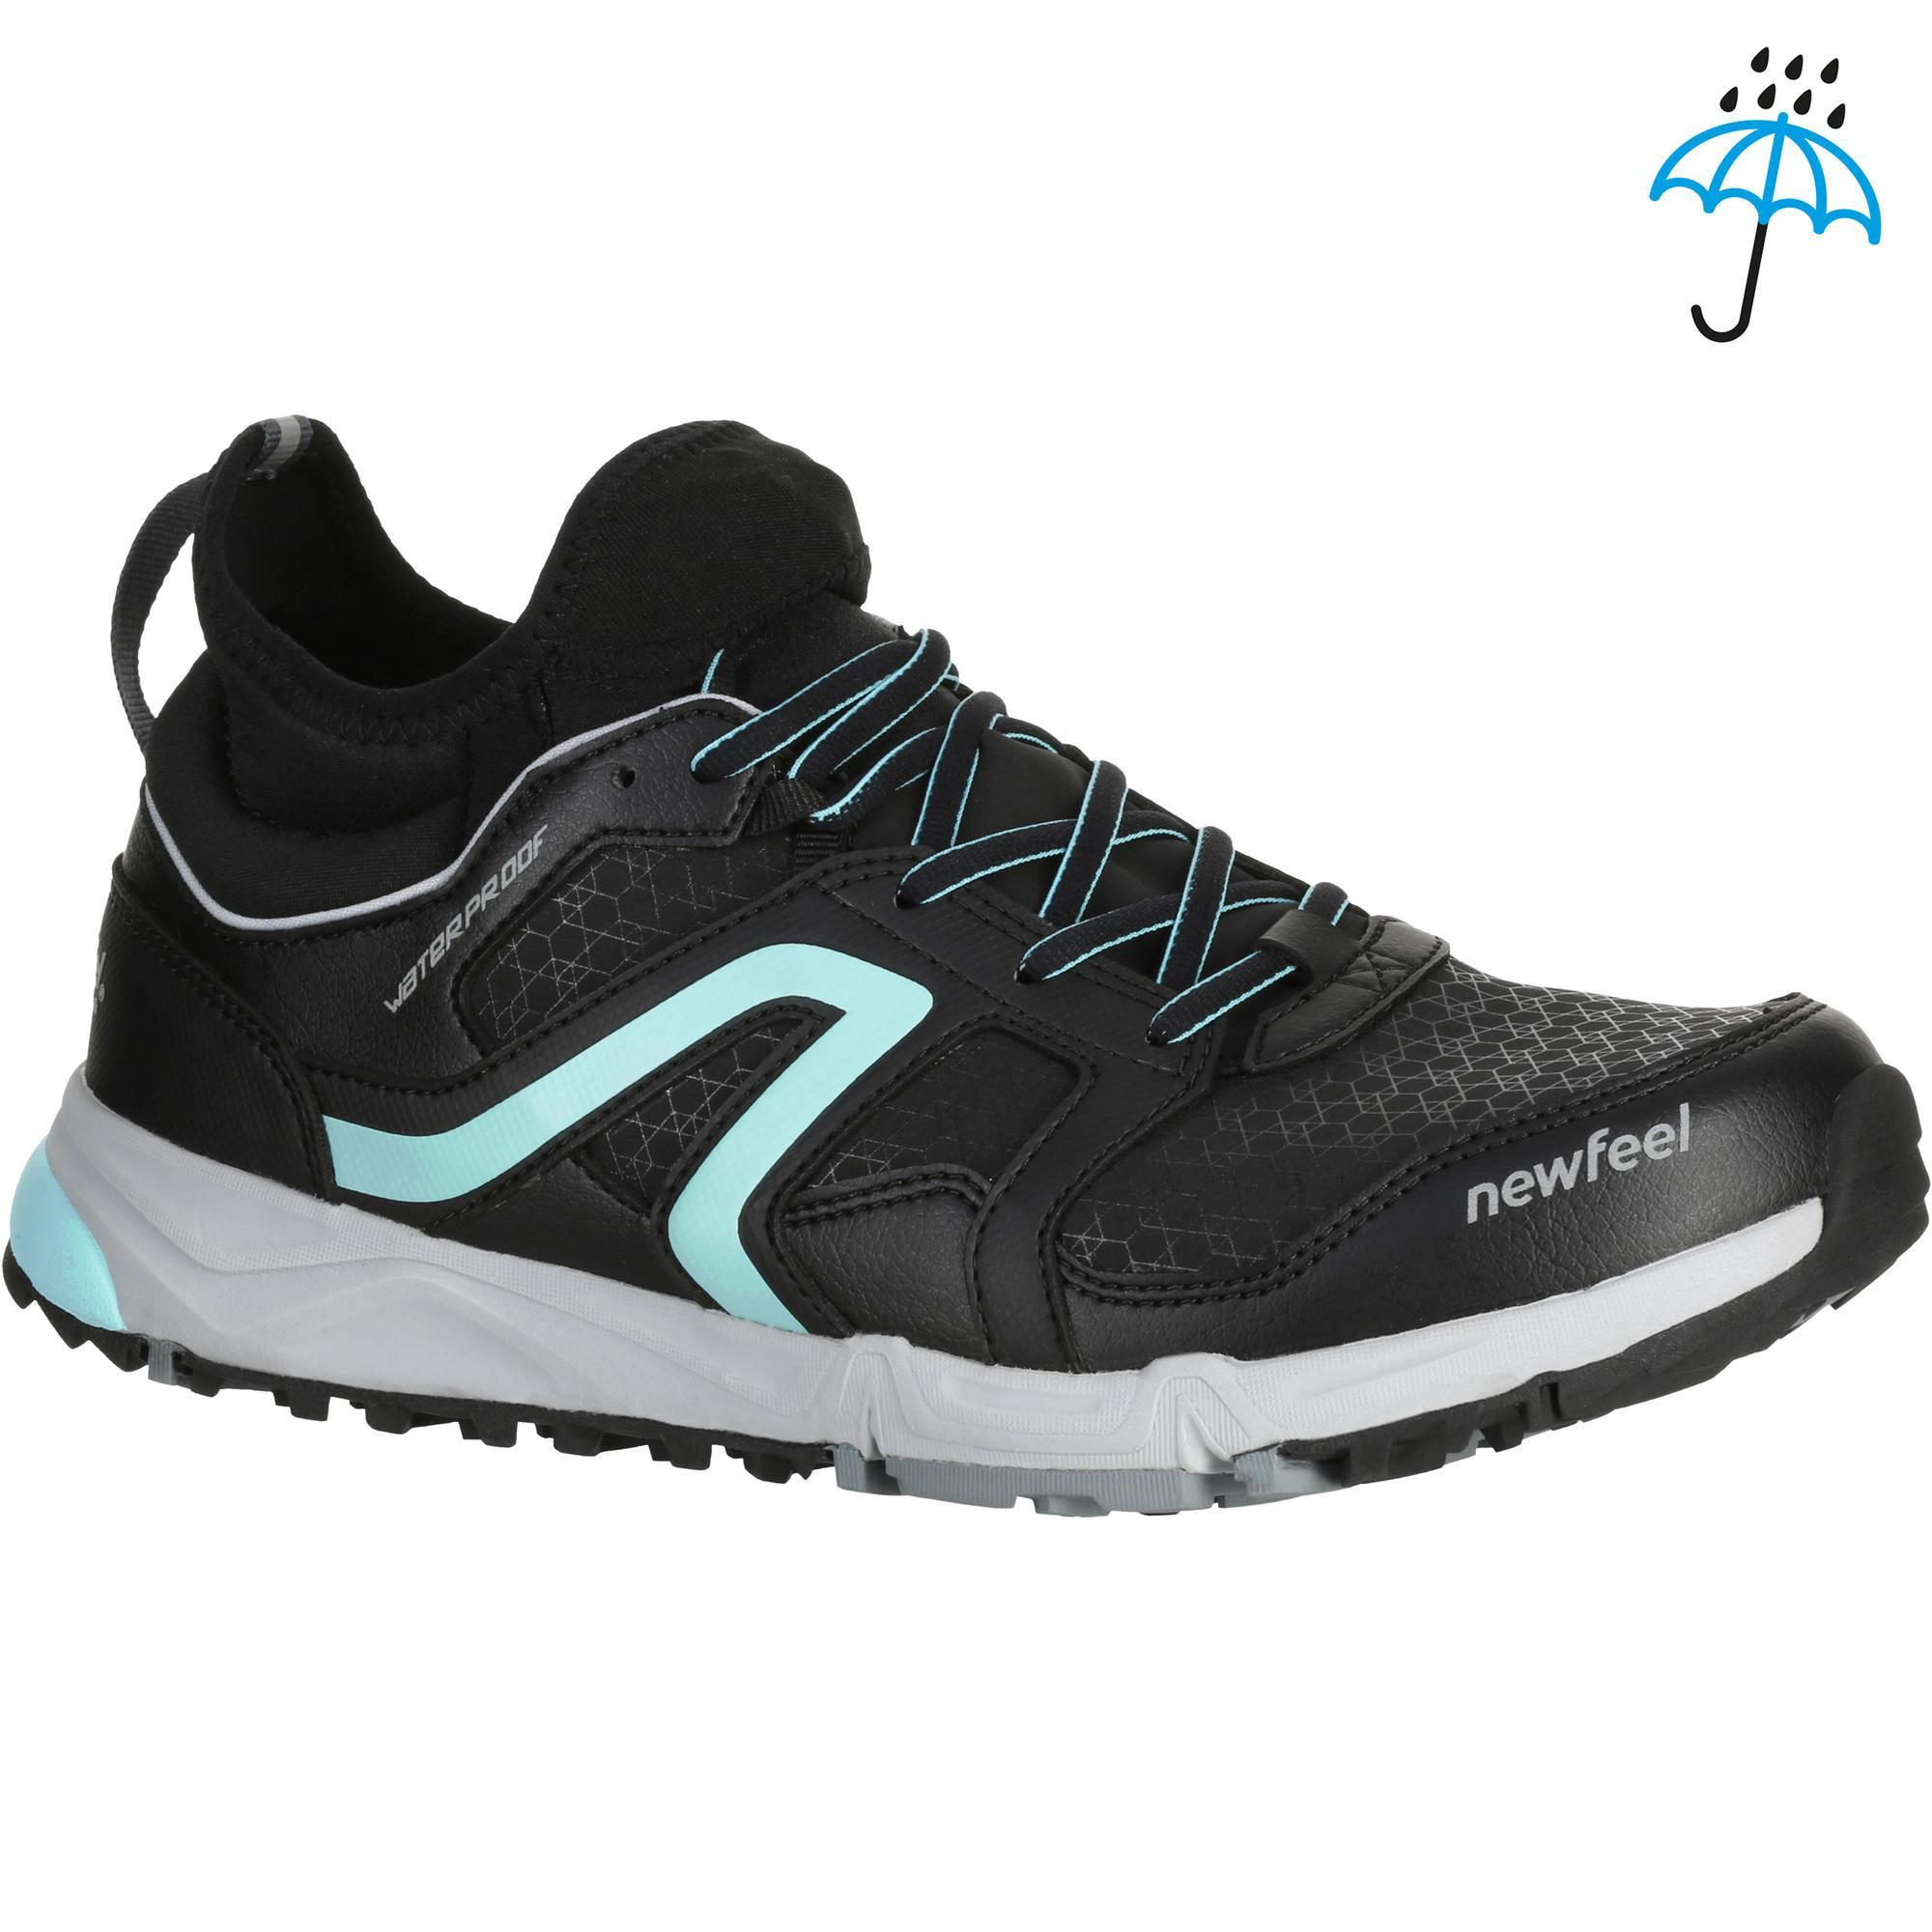 Chaussures de marche nordique femme NW 580 Flex-H Waterproof noir / bleu - Newfeel